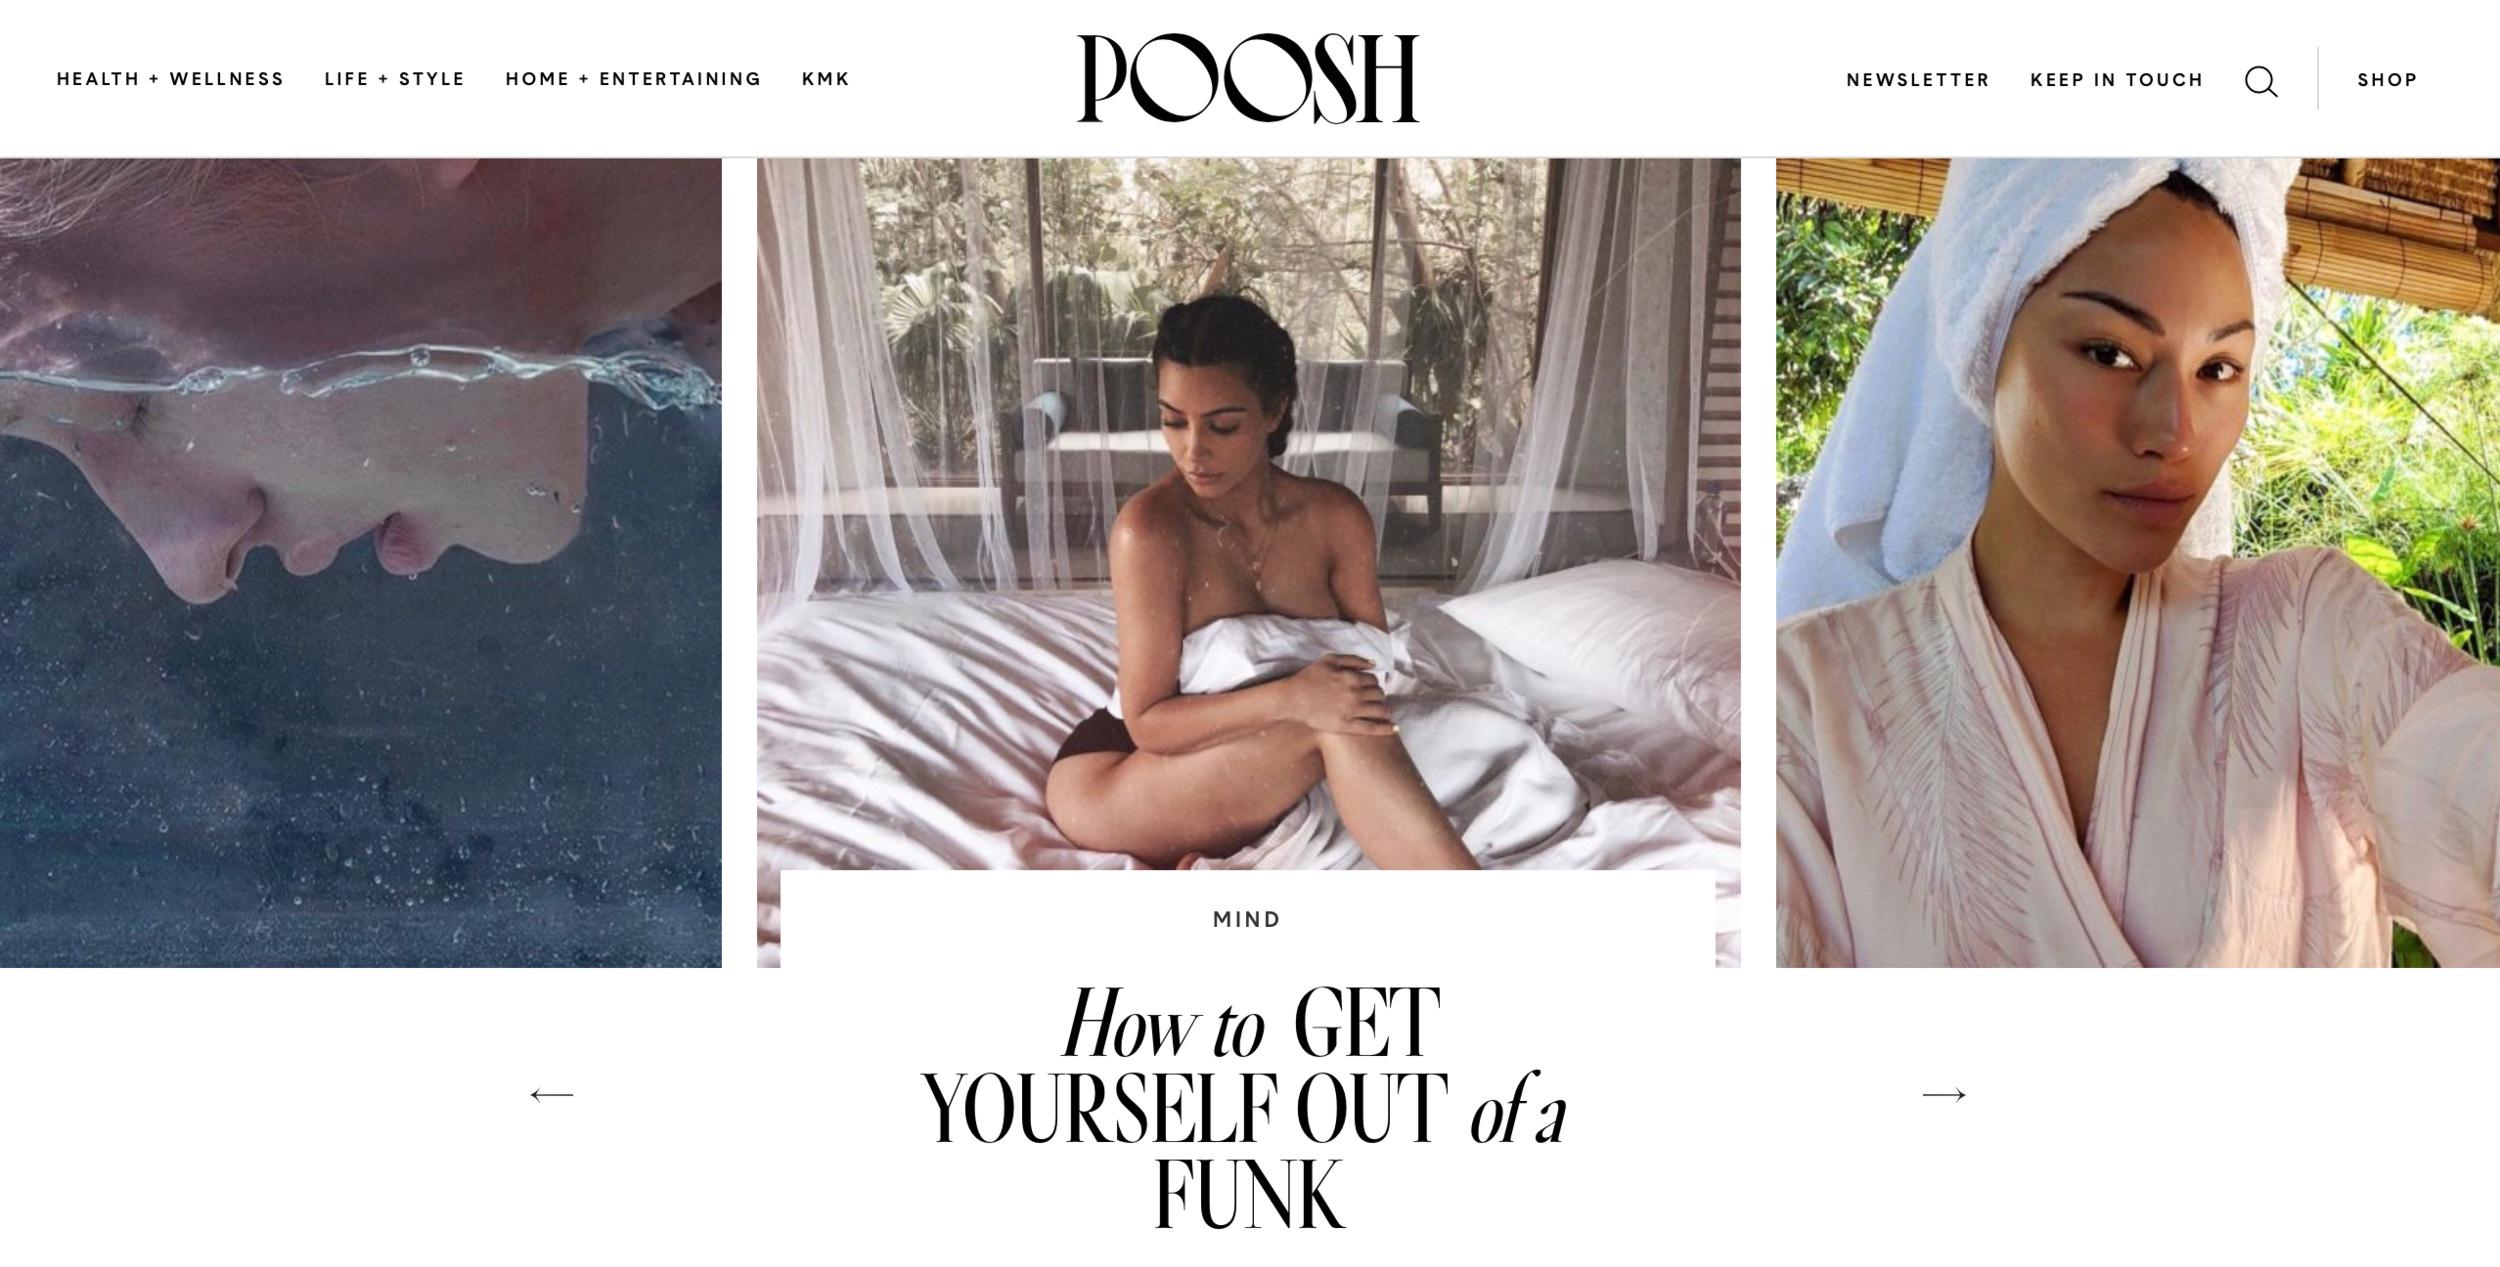 image: Poosh